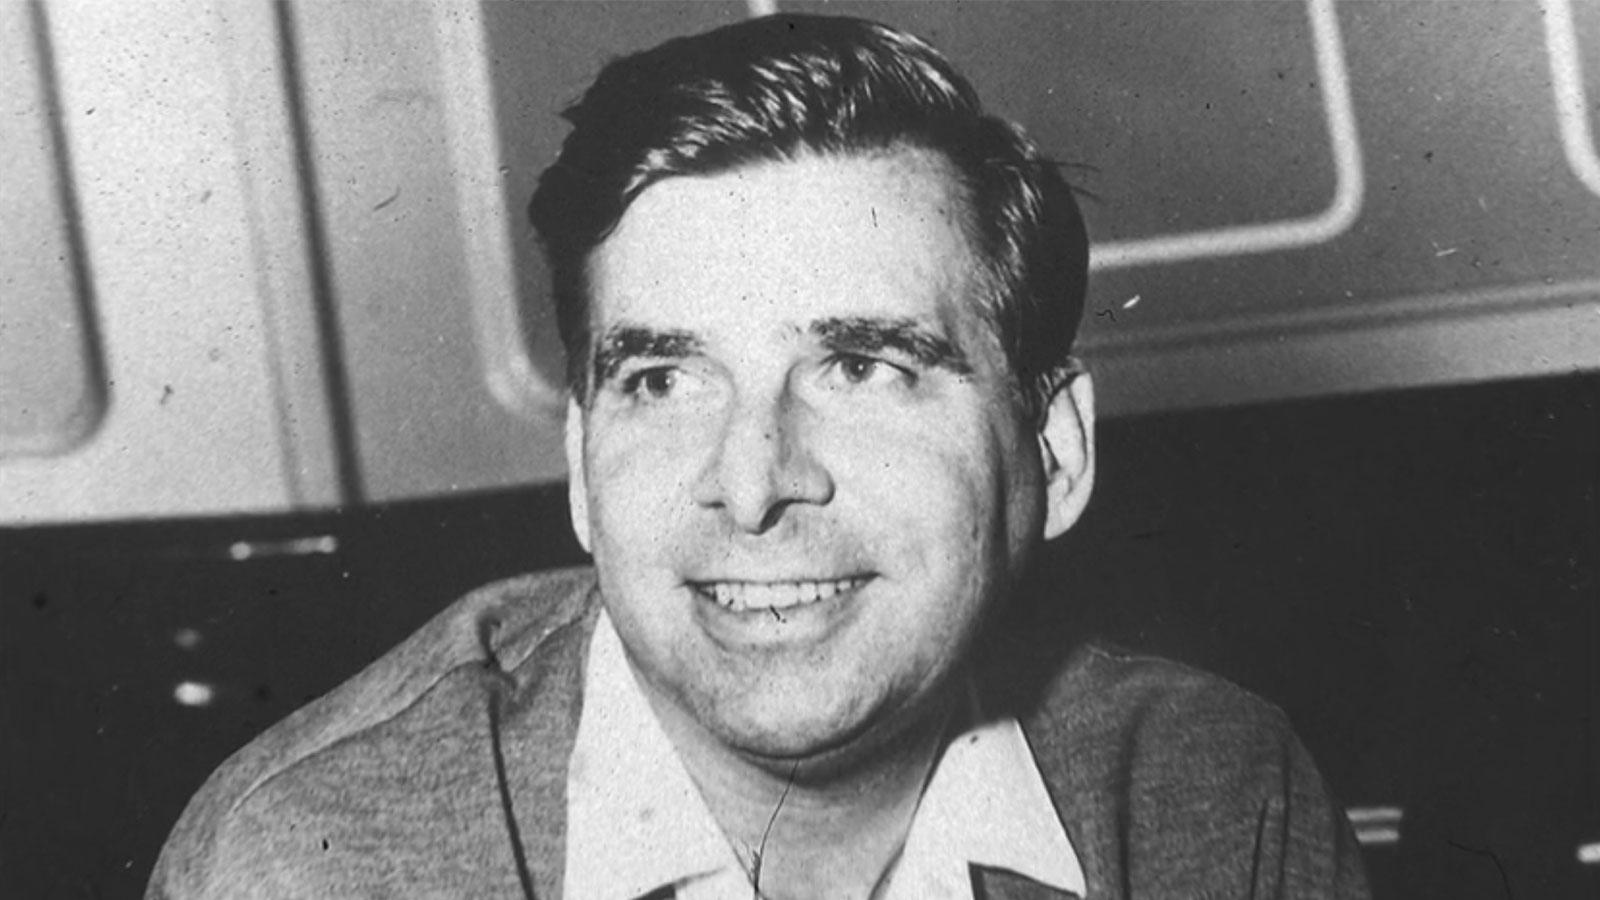 Remembering 'Star Trek' Creator Gene Roddenberry On His 99th Birthday